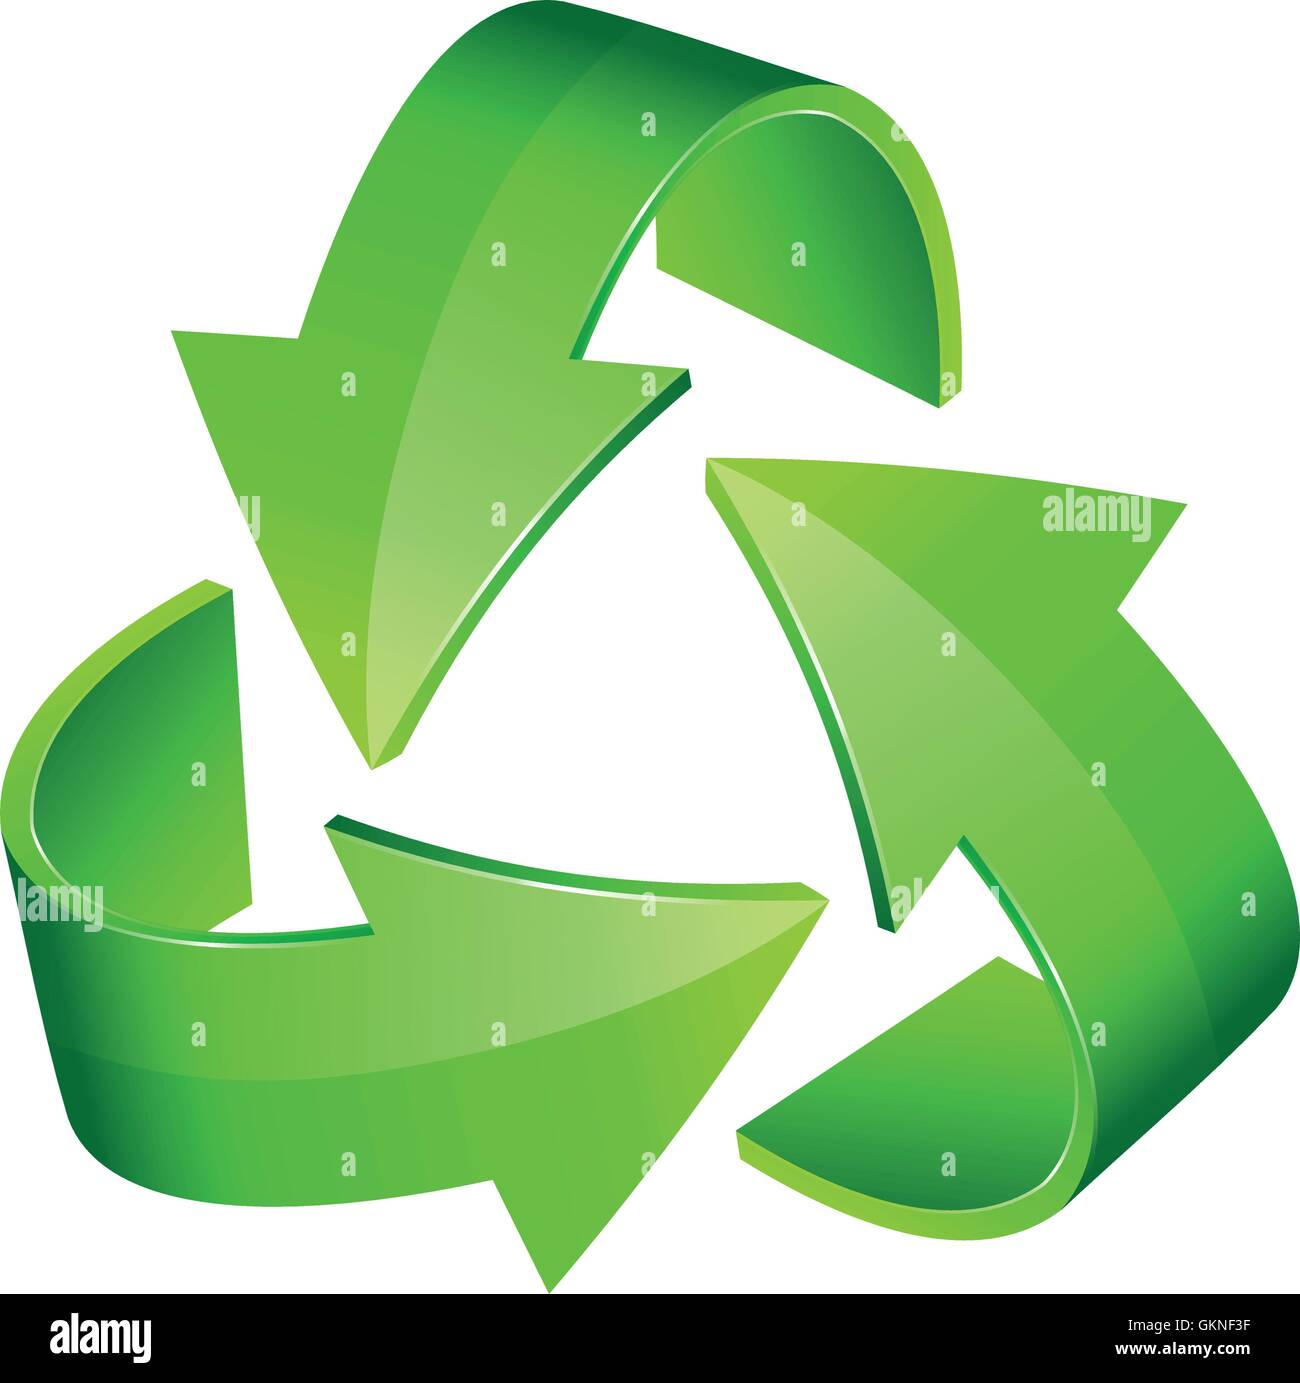 Dardos flechas flecha icono reciclaje logotipo ecol gico for Ambiente design